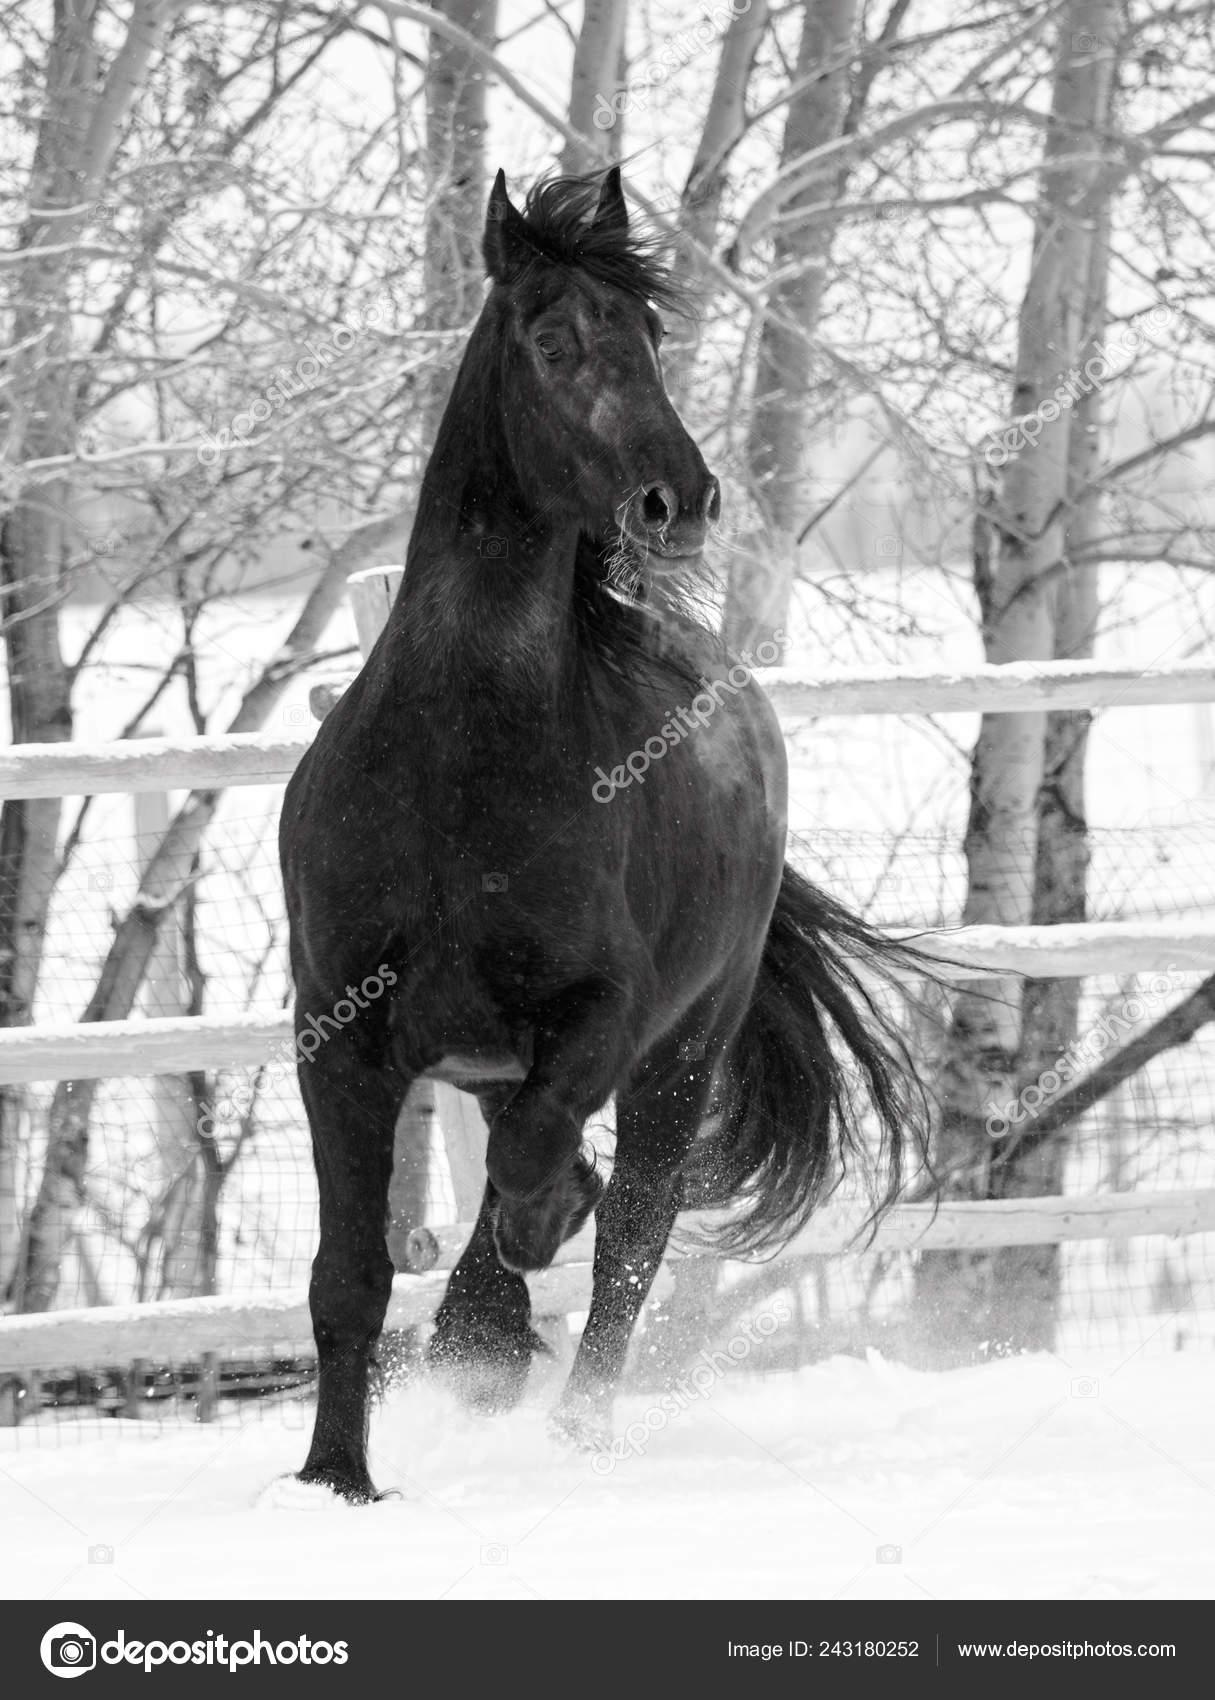 Black White Image Friesian Horse Running Snow Stock Photo C Feeferlump 243180252